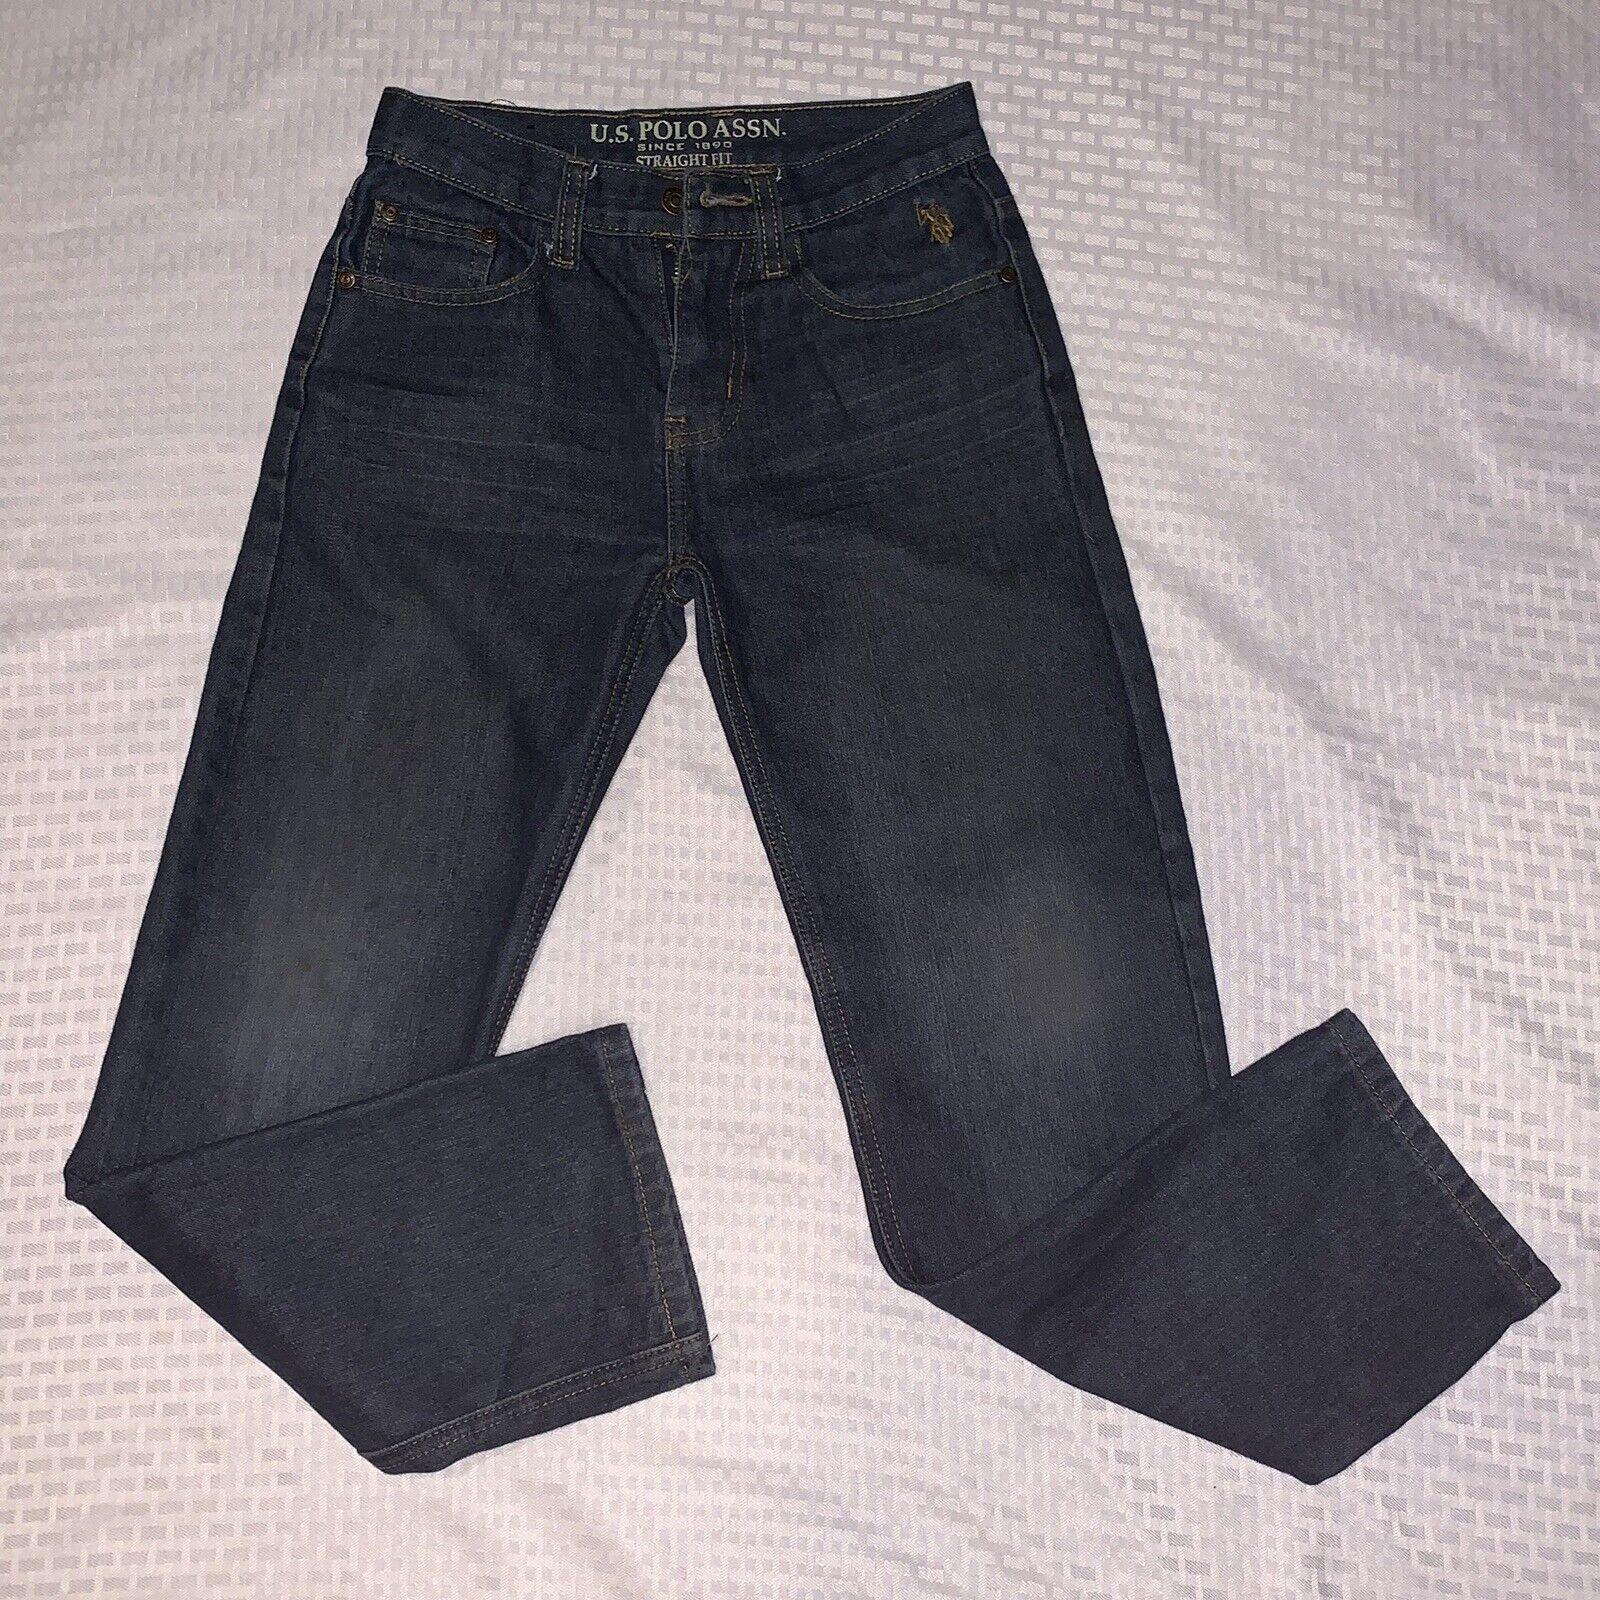 Polo Ralph Lauren Straight leg bluee Denim  Jeans, Womens Size 10